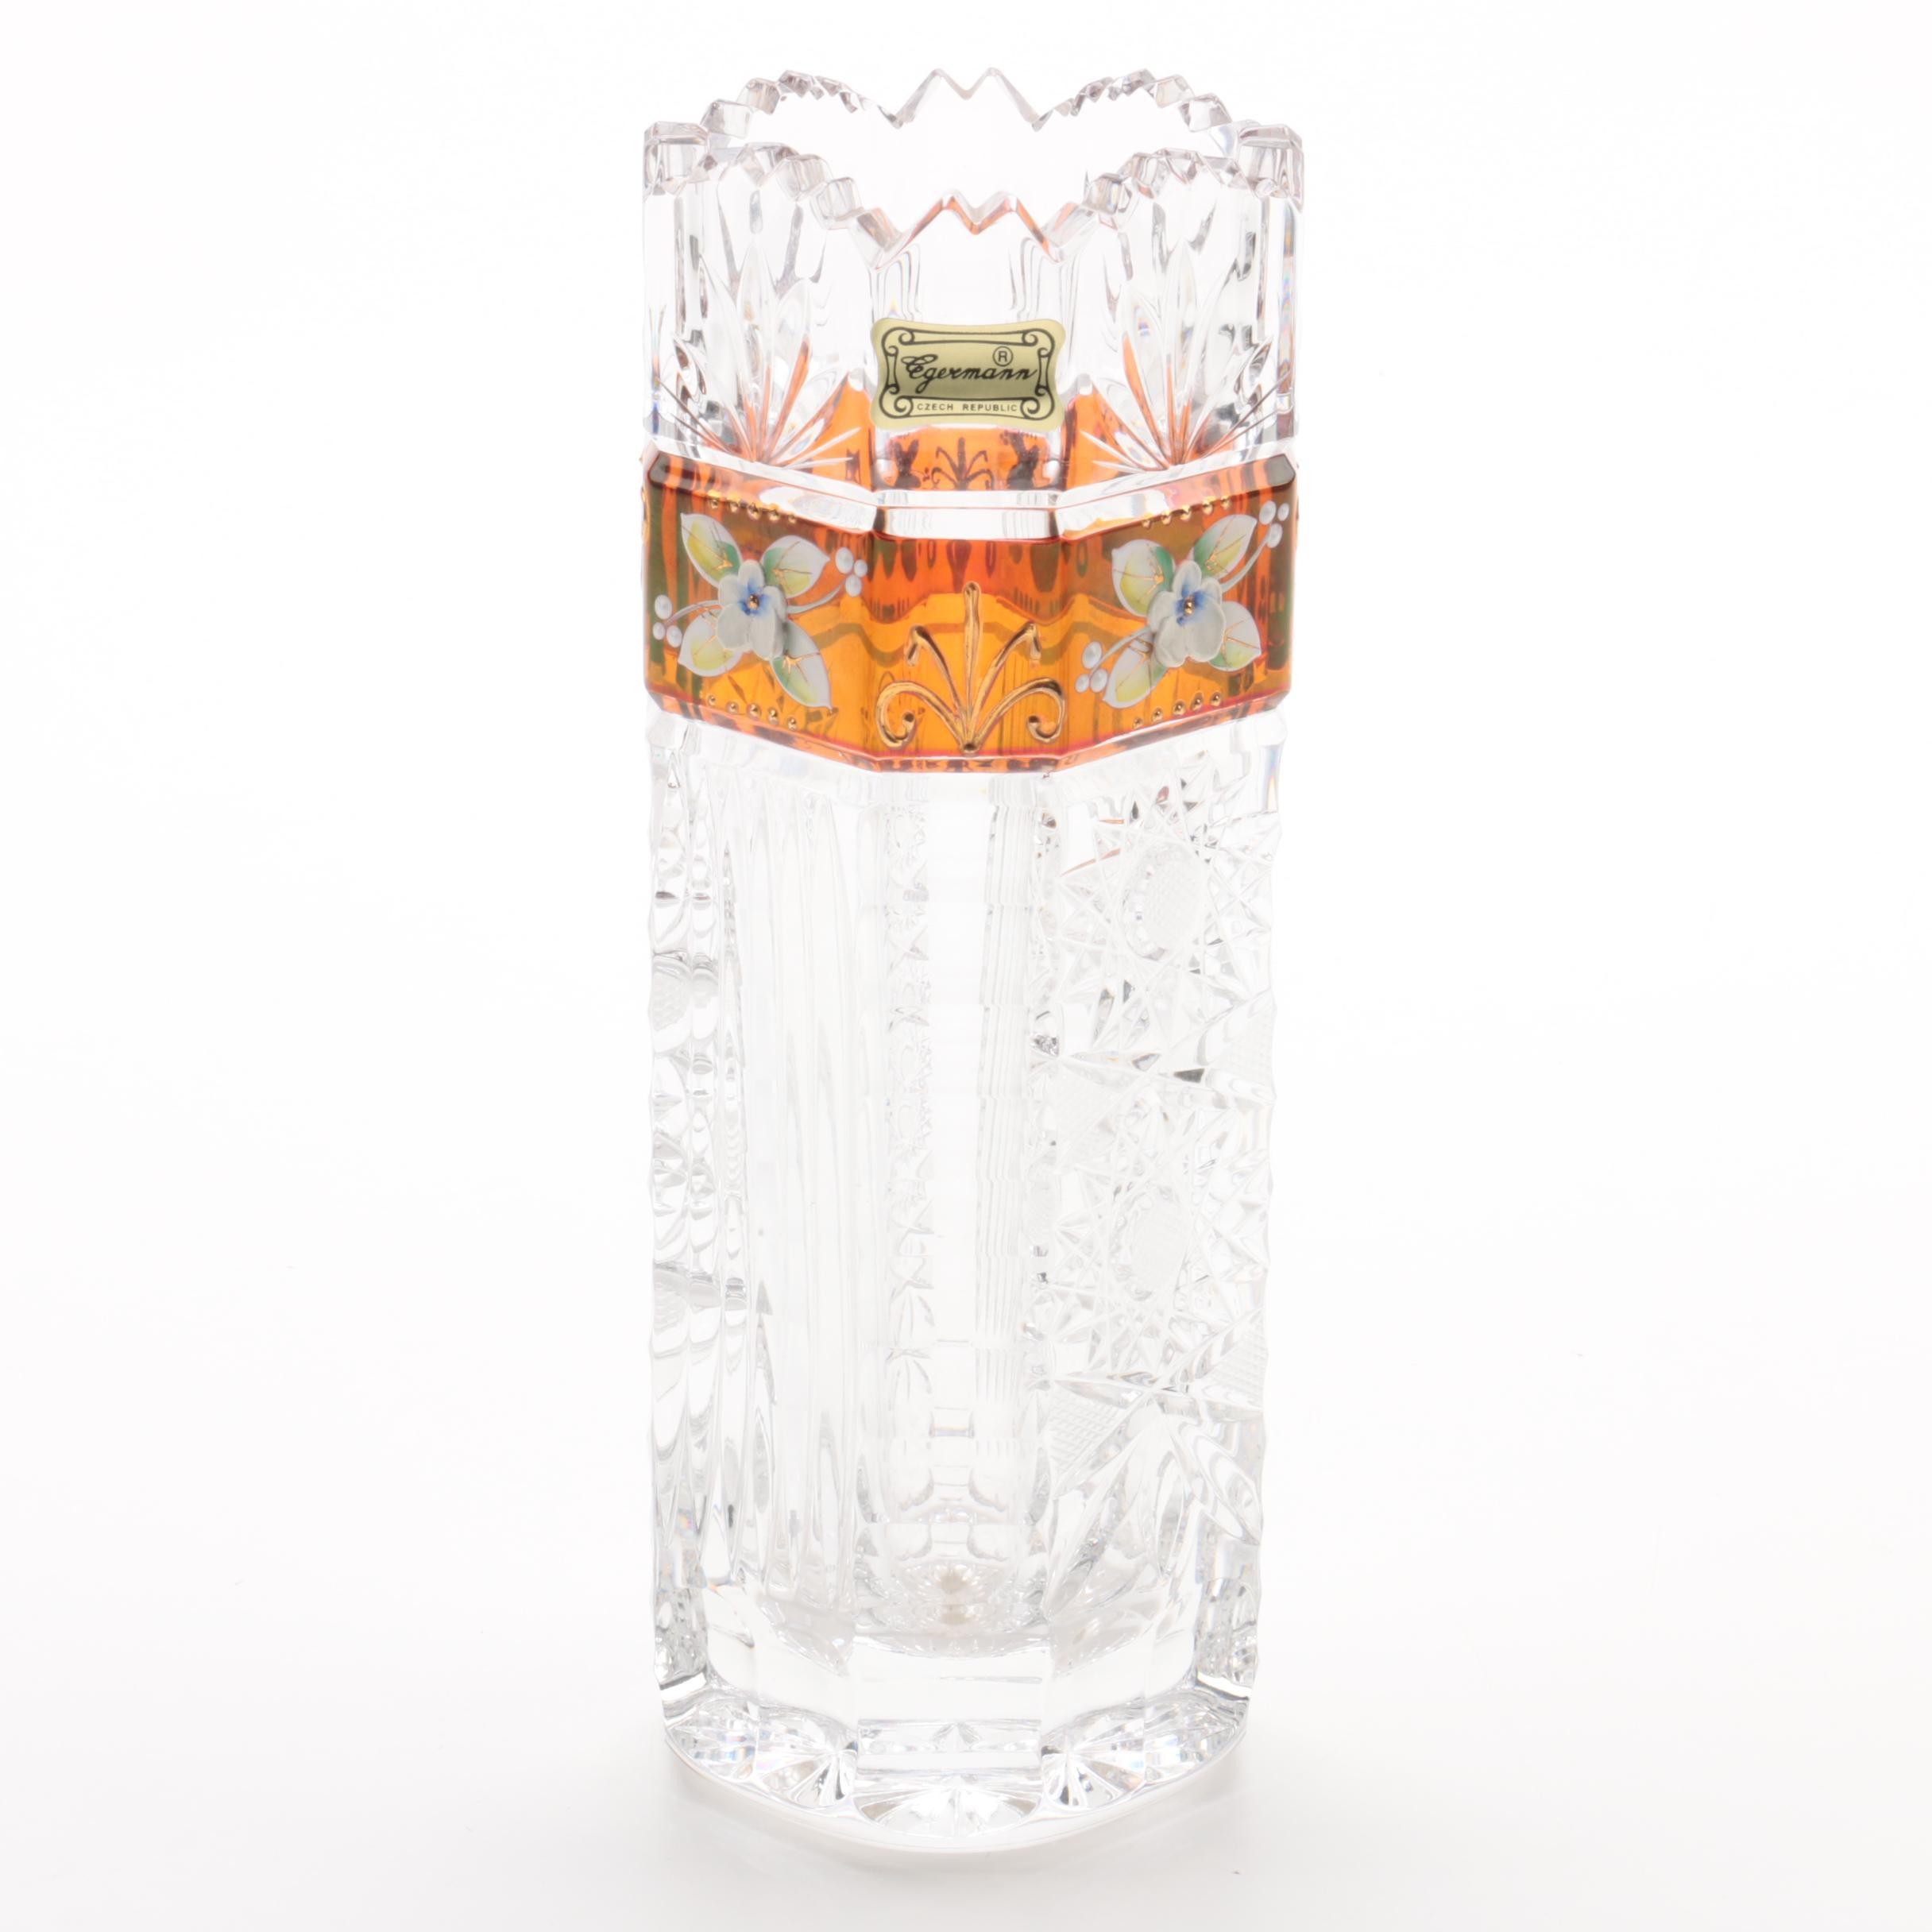 Egermann Czech Republic Crystal Vase